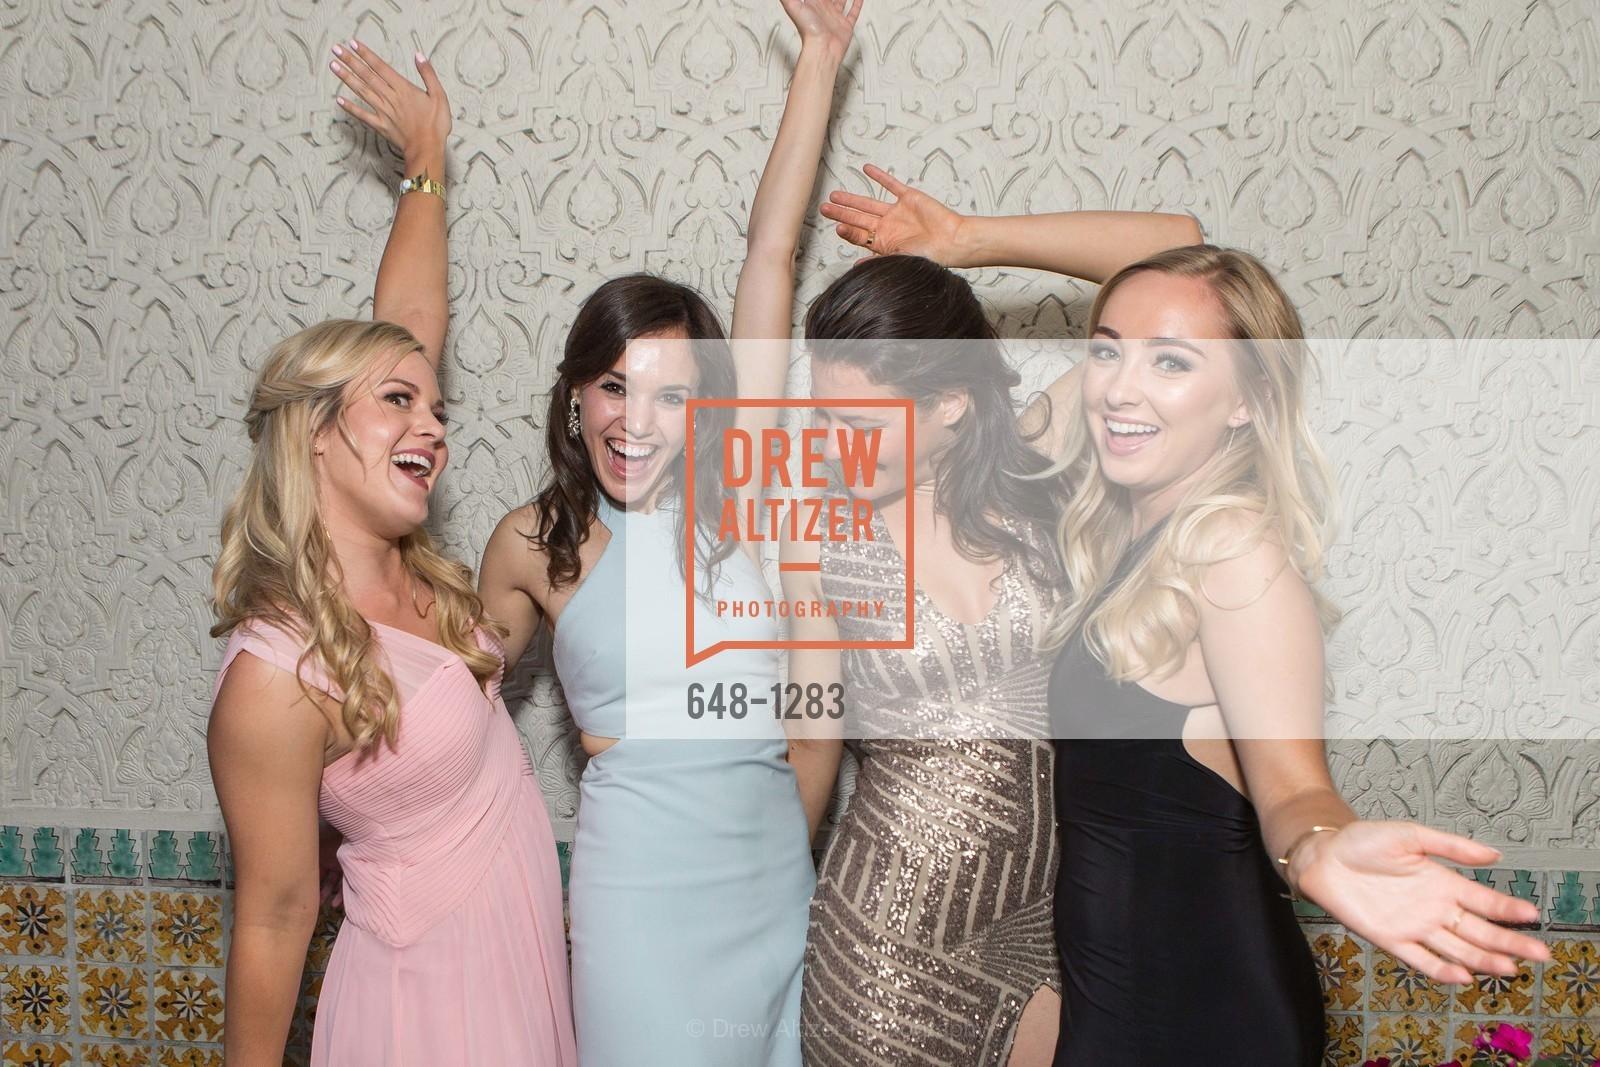 Dana Nicholson, Shana Lowenthal, Celine Buehl, Morgan Barnes, Spinsters of San Francisco Annual Ball 2016, US, June 25th, 2016